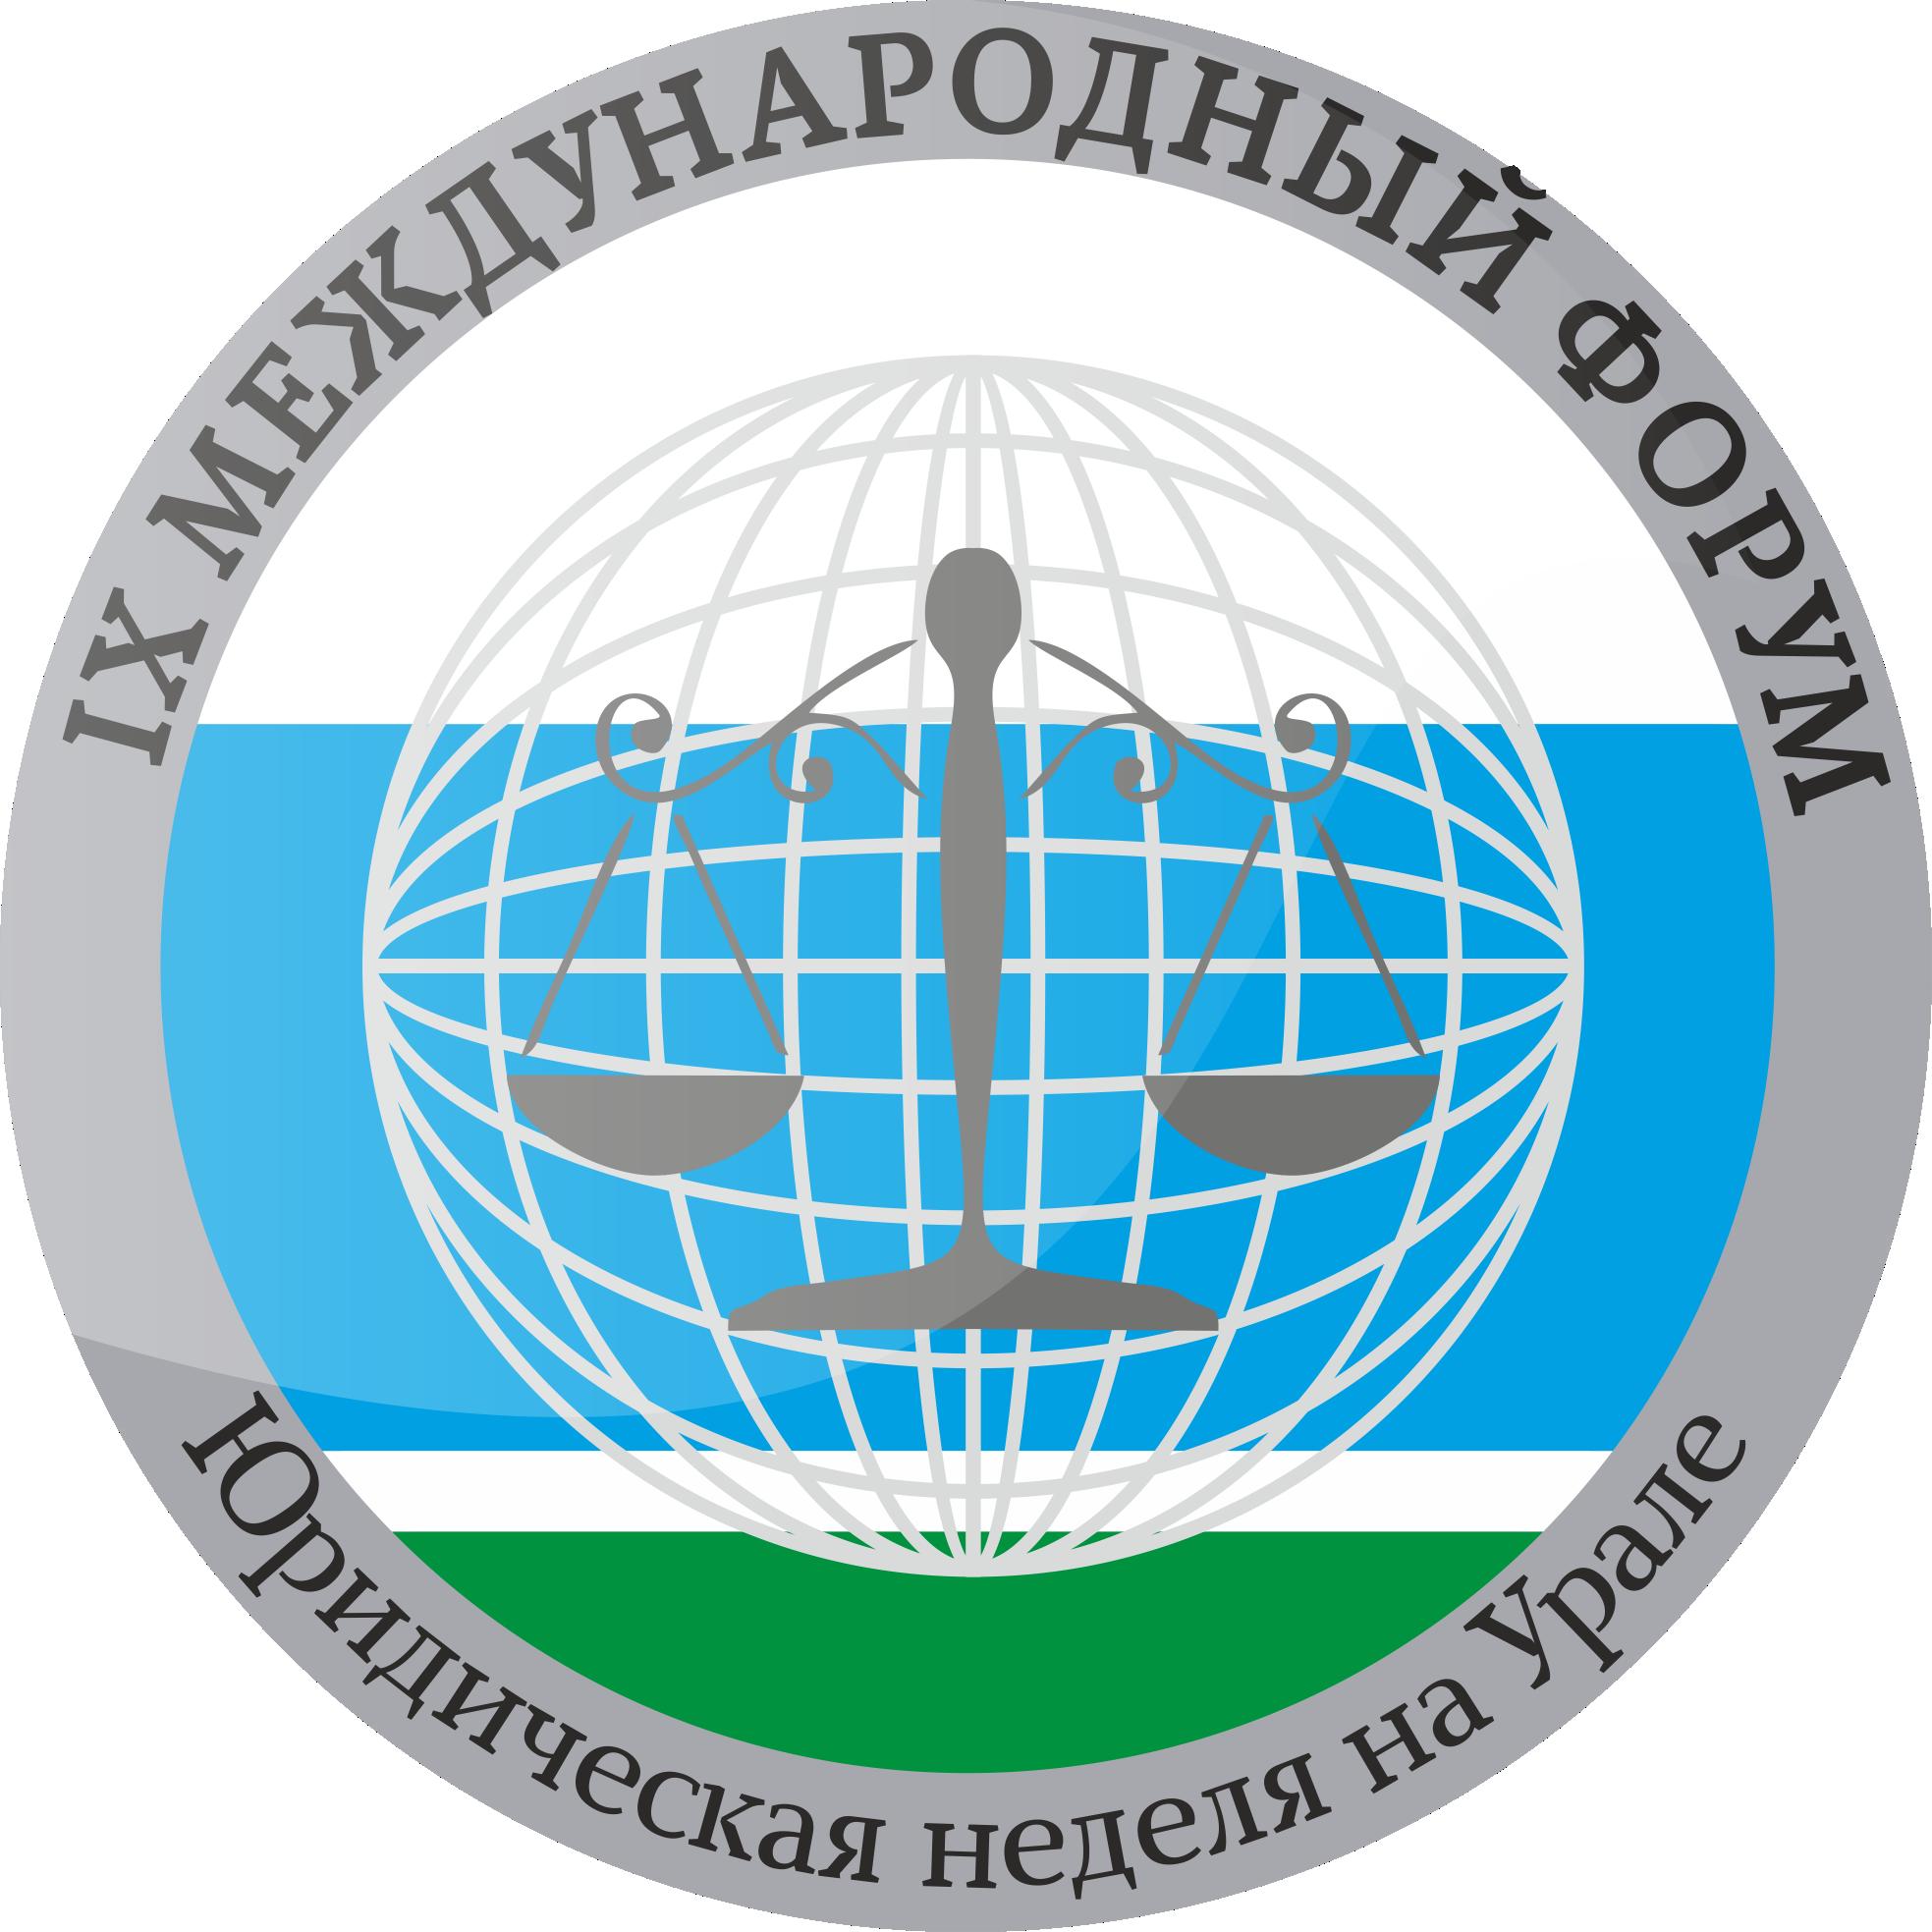 Ural Law Academy (USLA) in Yekaterinburg: address, faculties, reviews 93